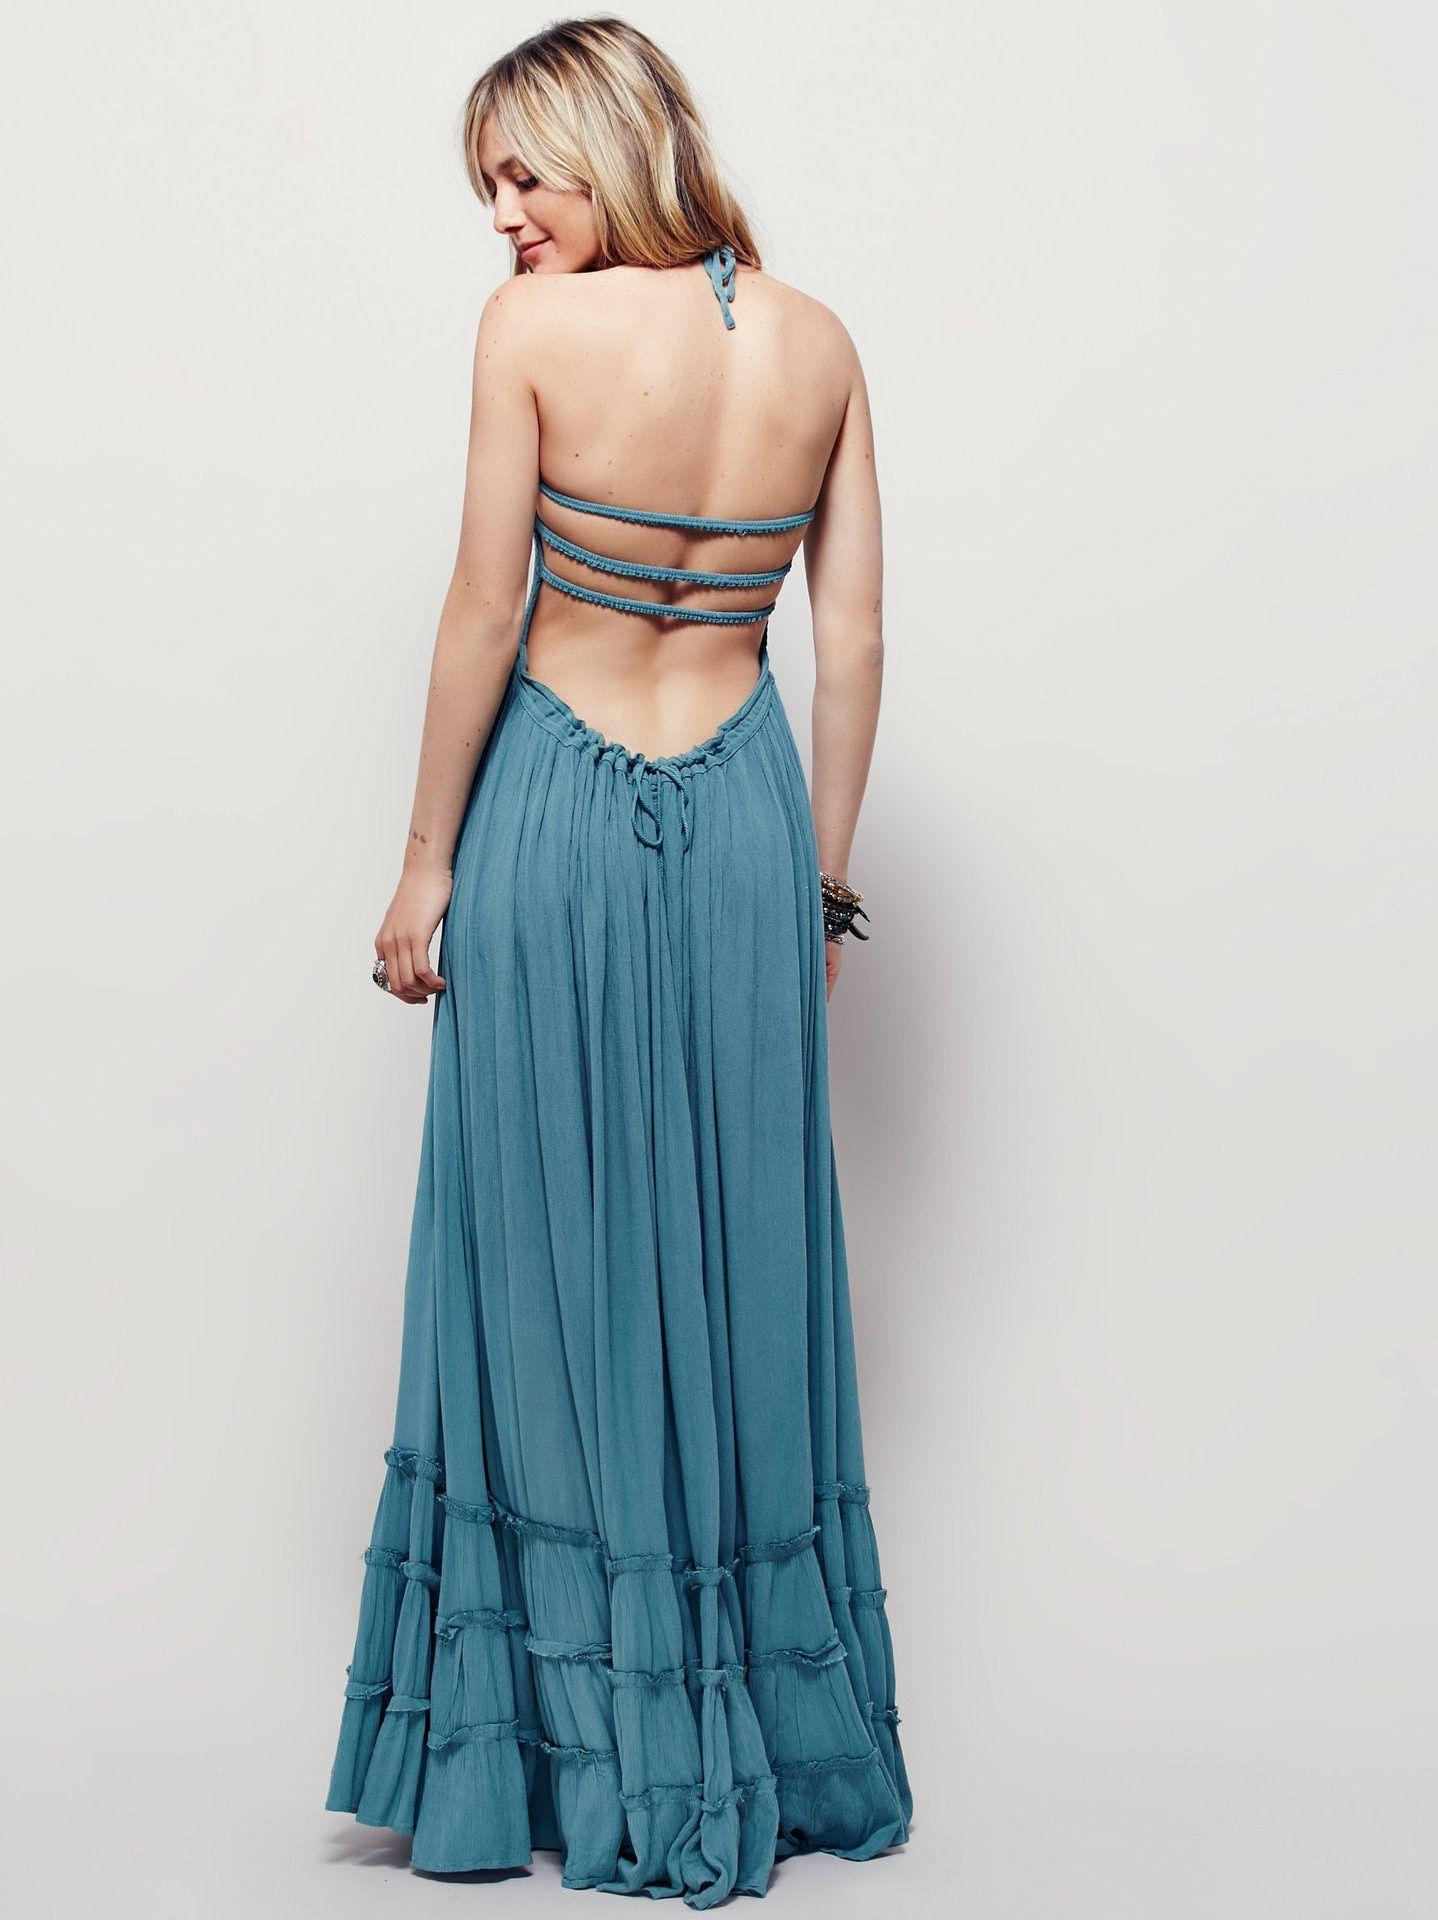 Backless Strapless Long Dress Uniqistic Com Boho Maxi Dress Backless Maxi Dresses Boho Dresses Long [ 1920 x 1438 Pixel ]